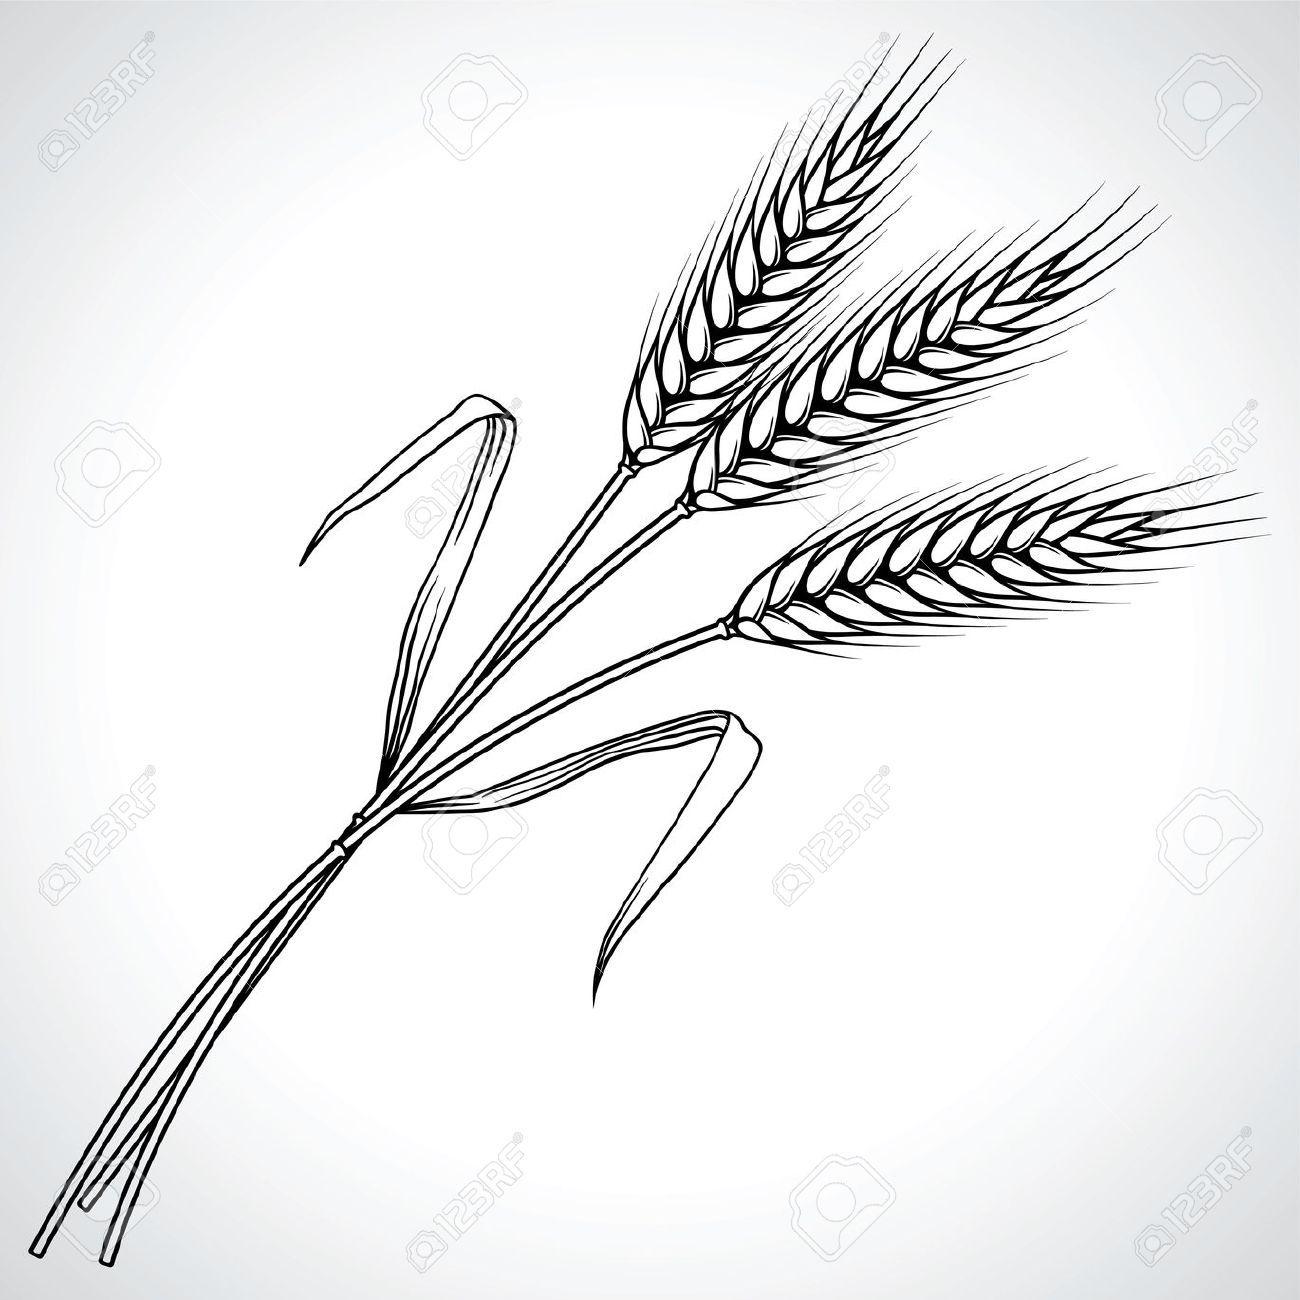 Wheat Black And White Google Search Wheat Tattoo Wheat Drawing Illustration